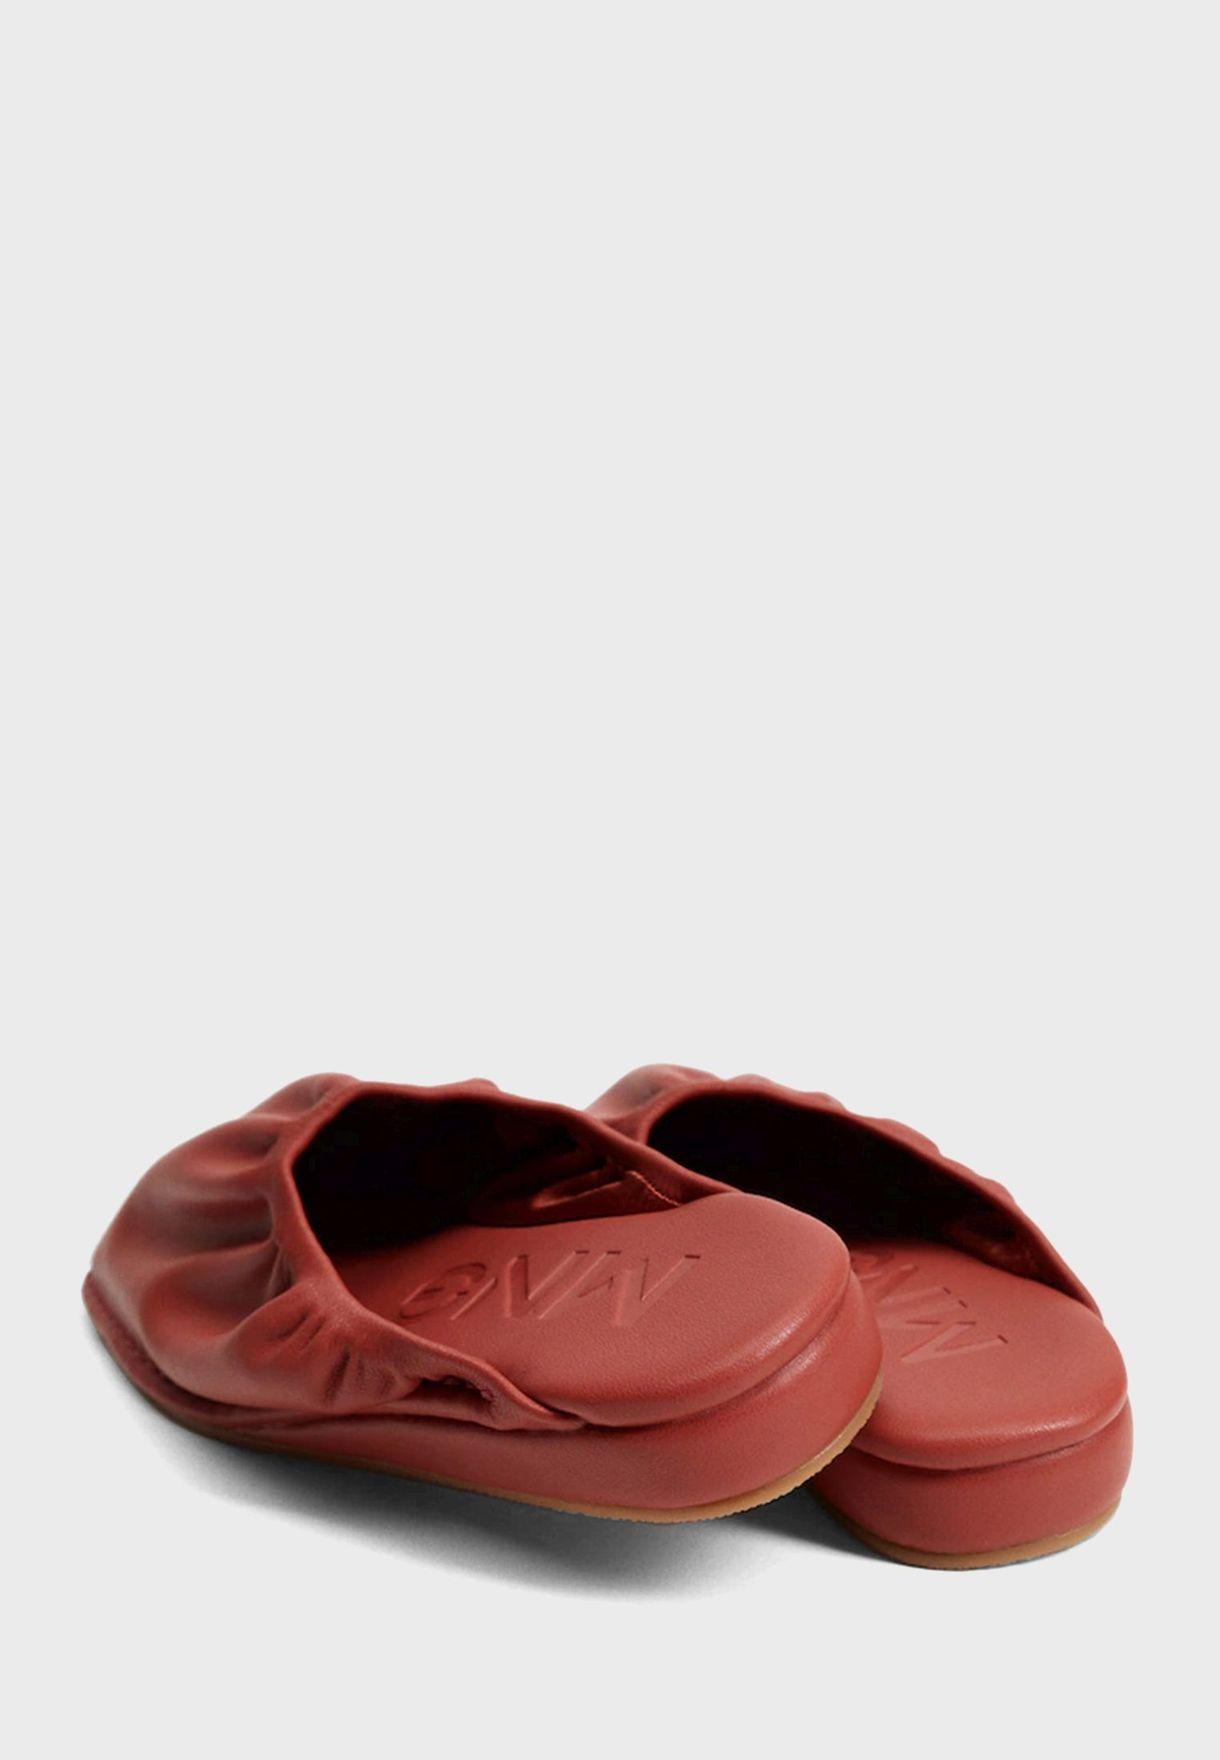 Gome Sandal